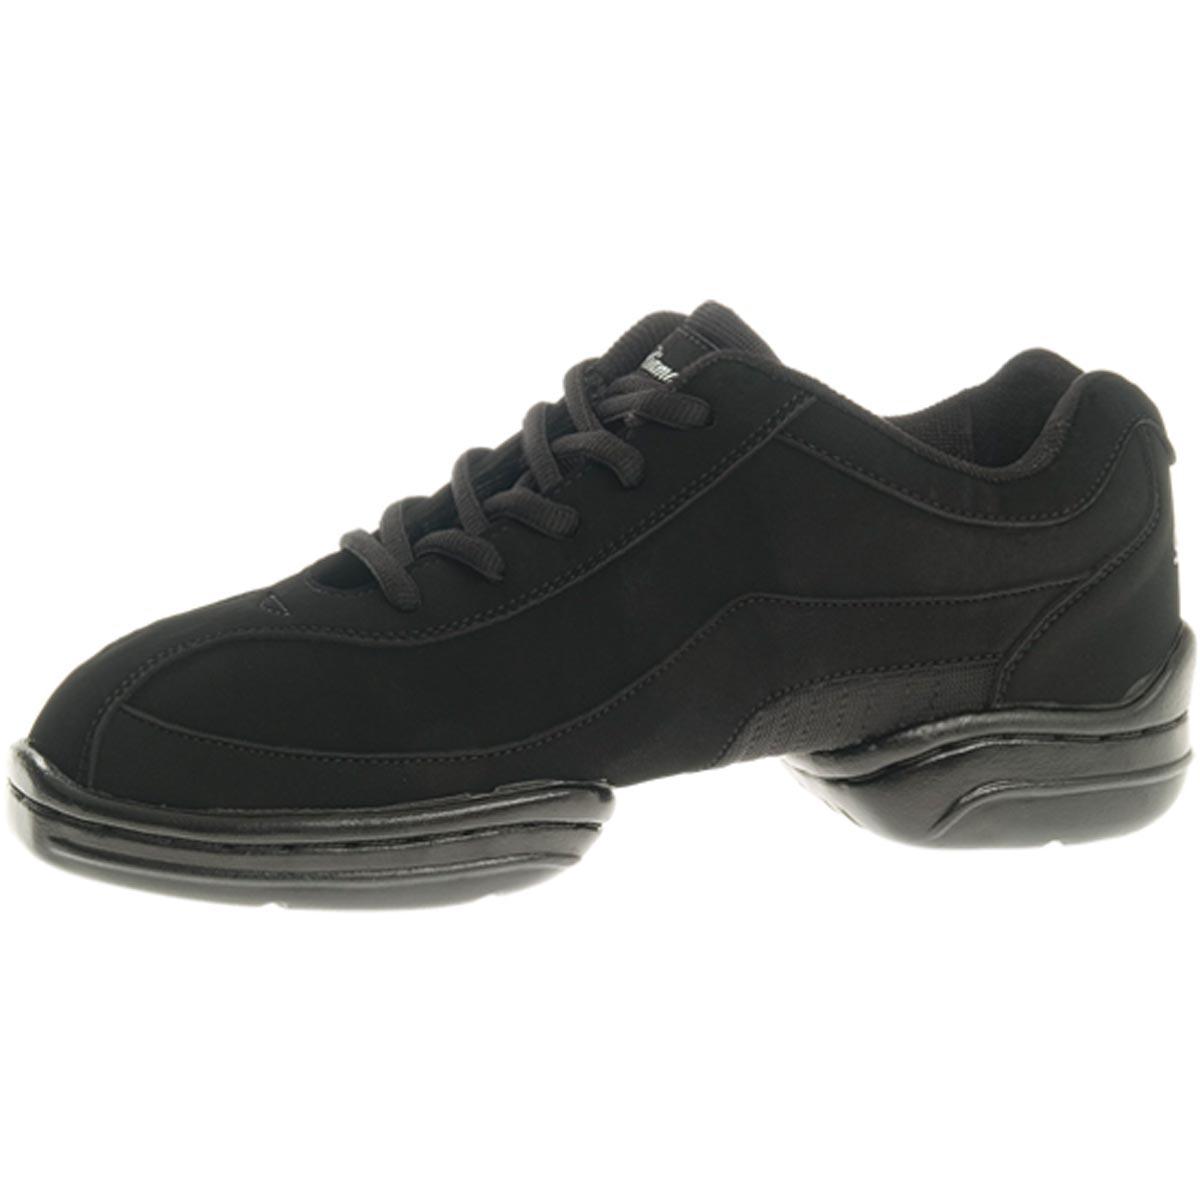 promo code 3f528 bb6b8 Diamant - Unisex Dance Sneakers DDS007-040 - Black